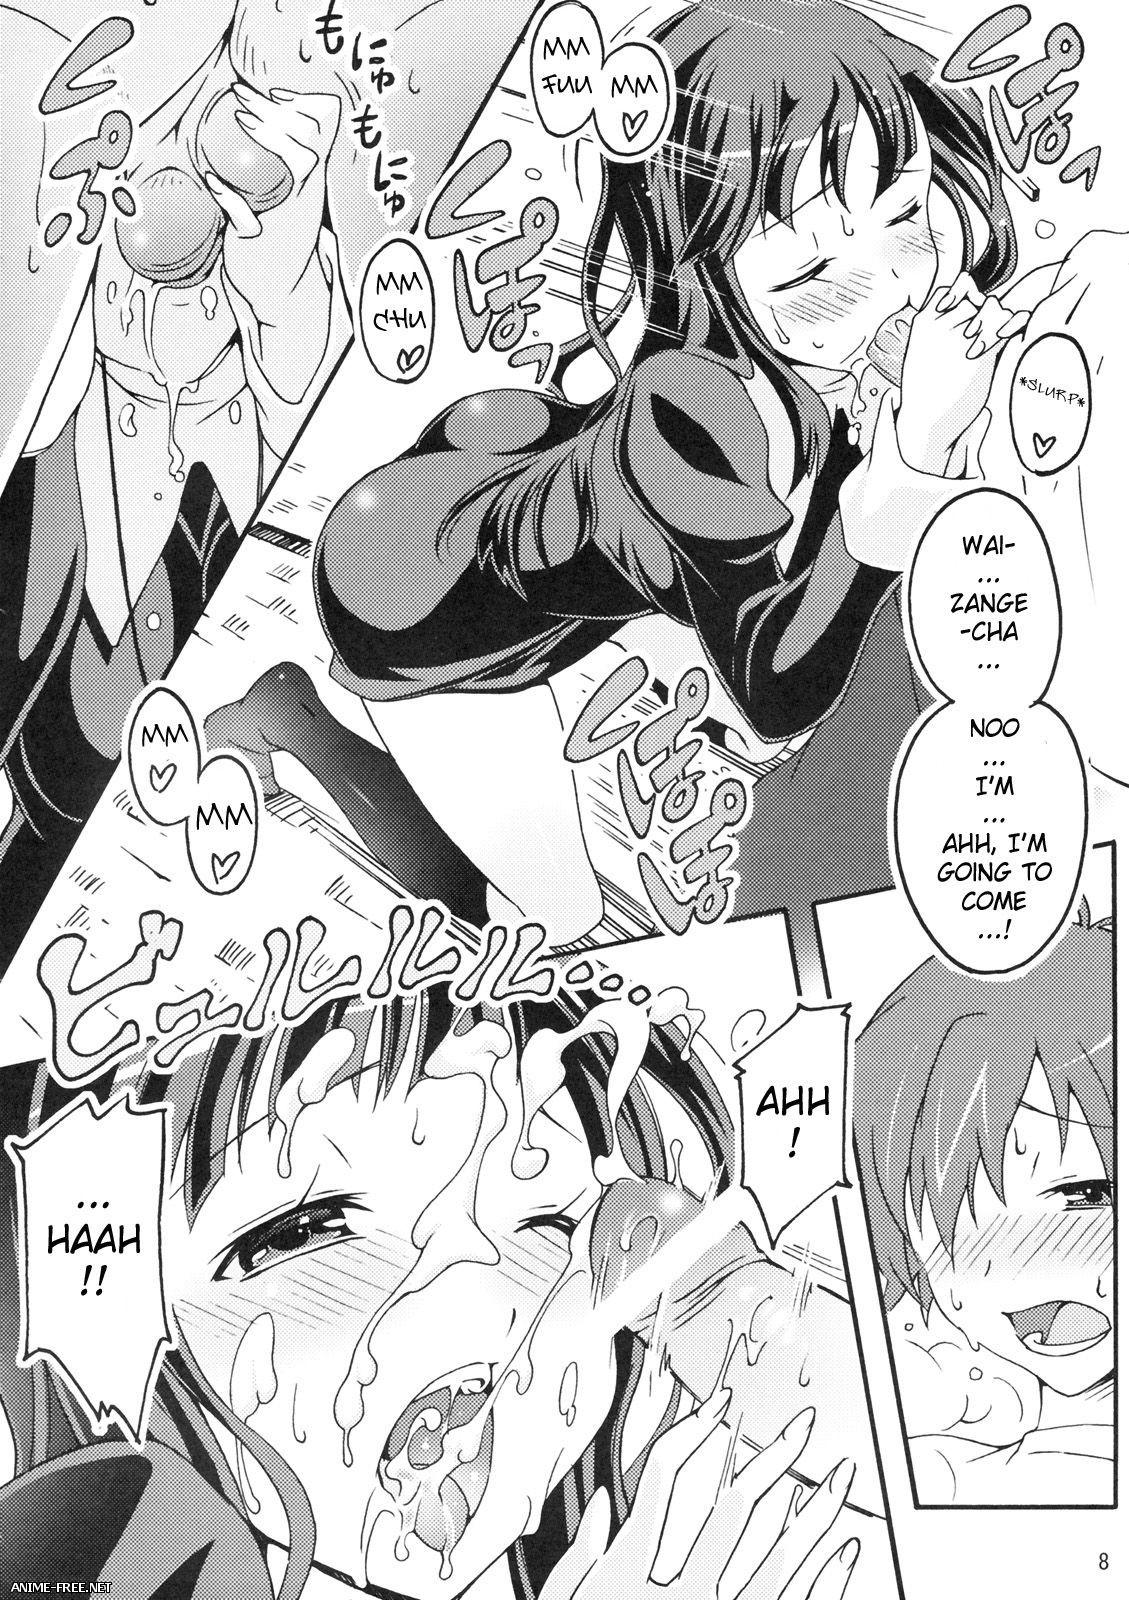 Suzutsuki Kurara / pinvise — Сборник хентай манги [Ptcen] [ENG,RUS,JAP] Manga Hentai